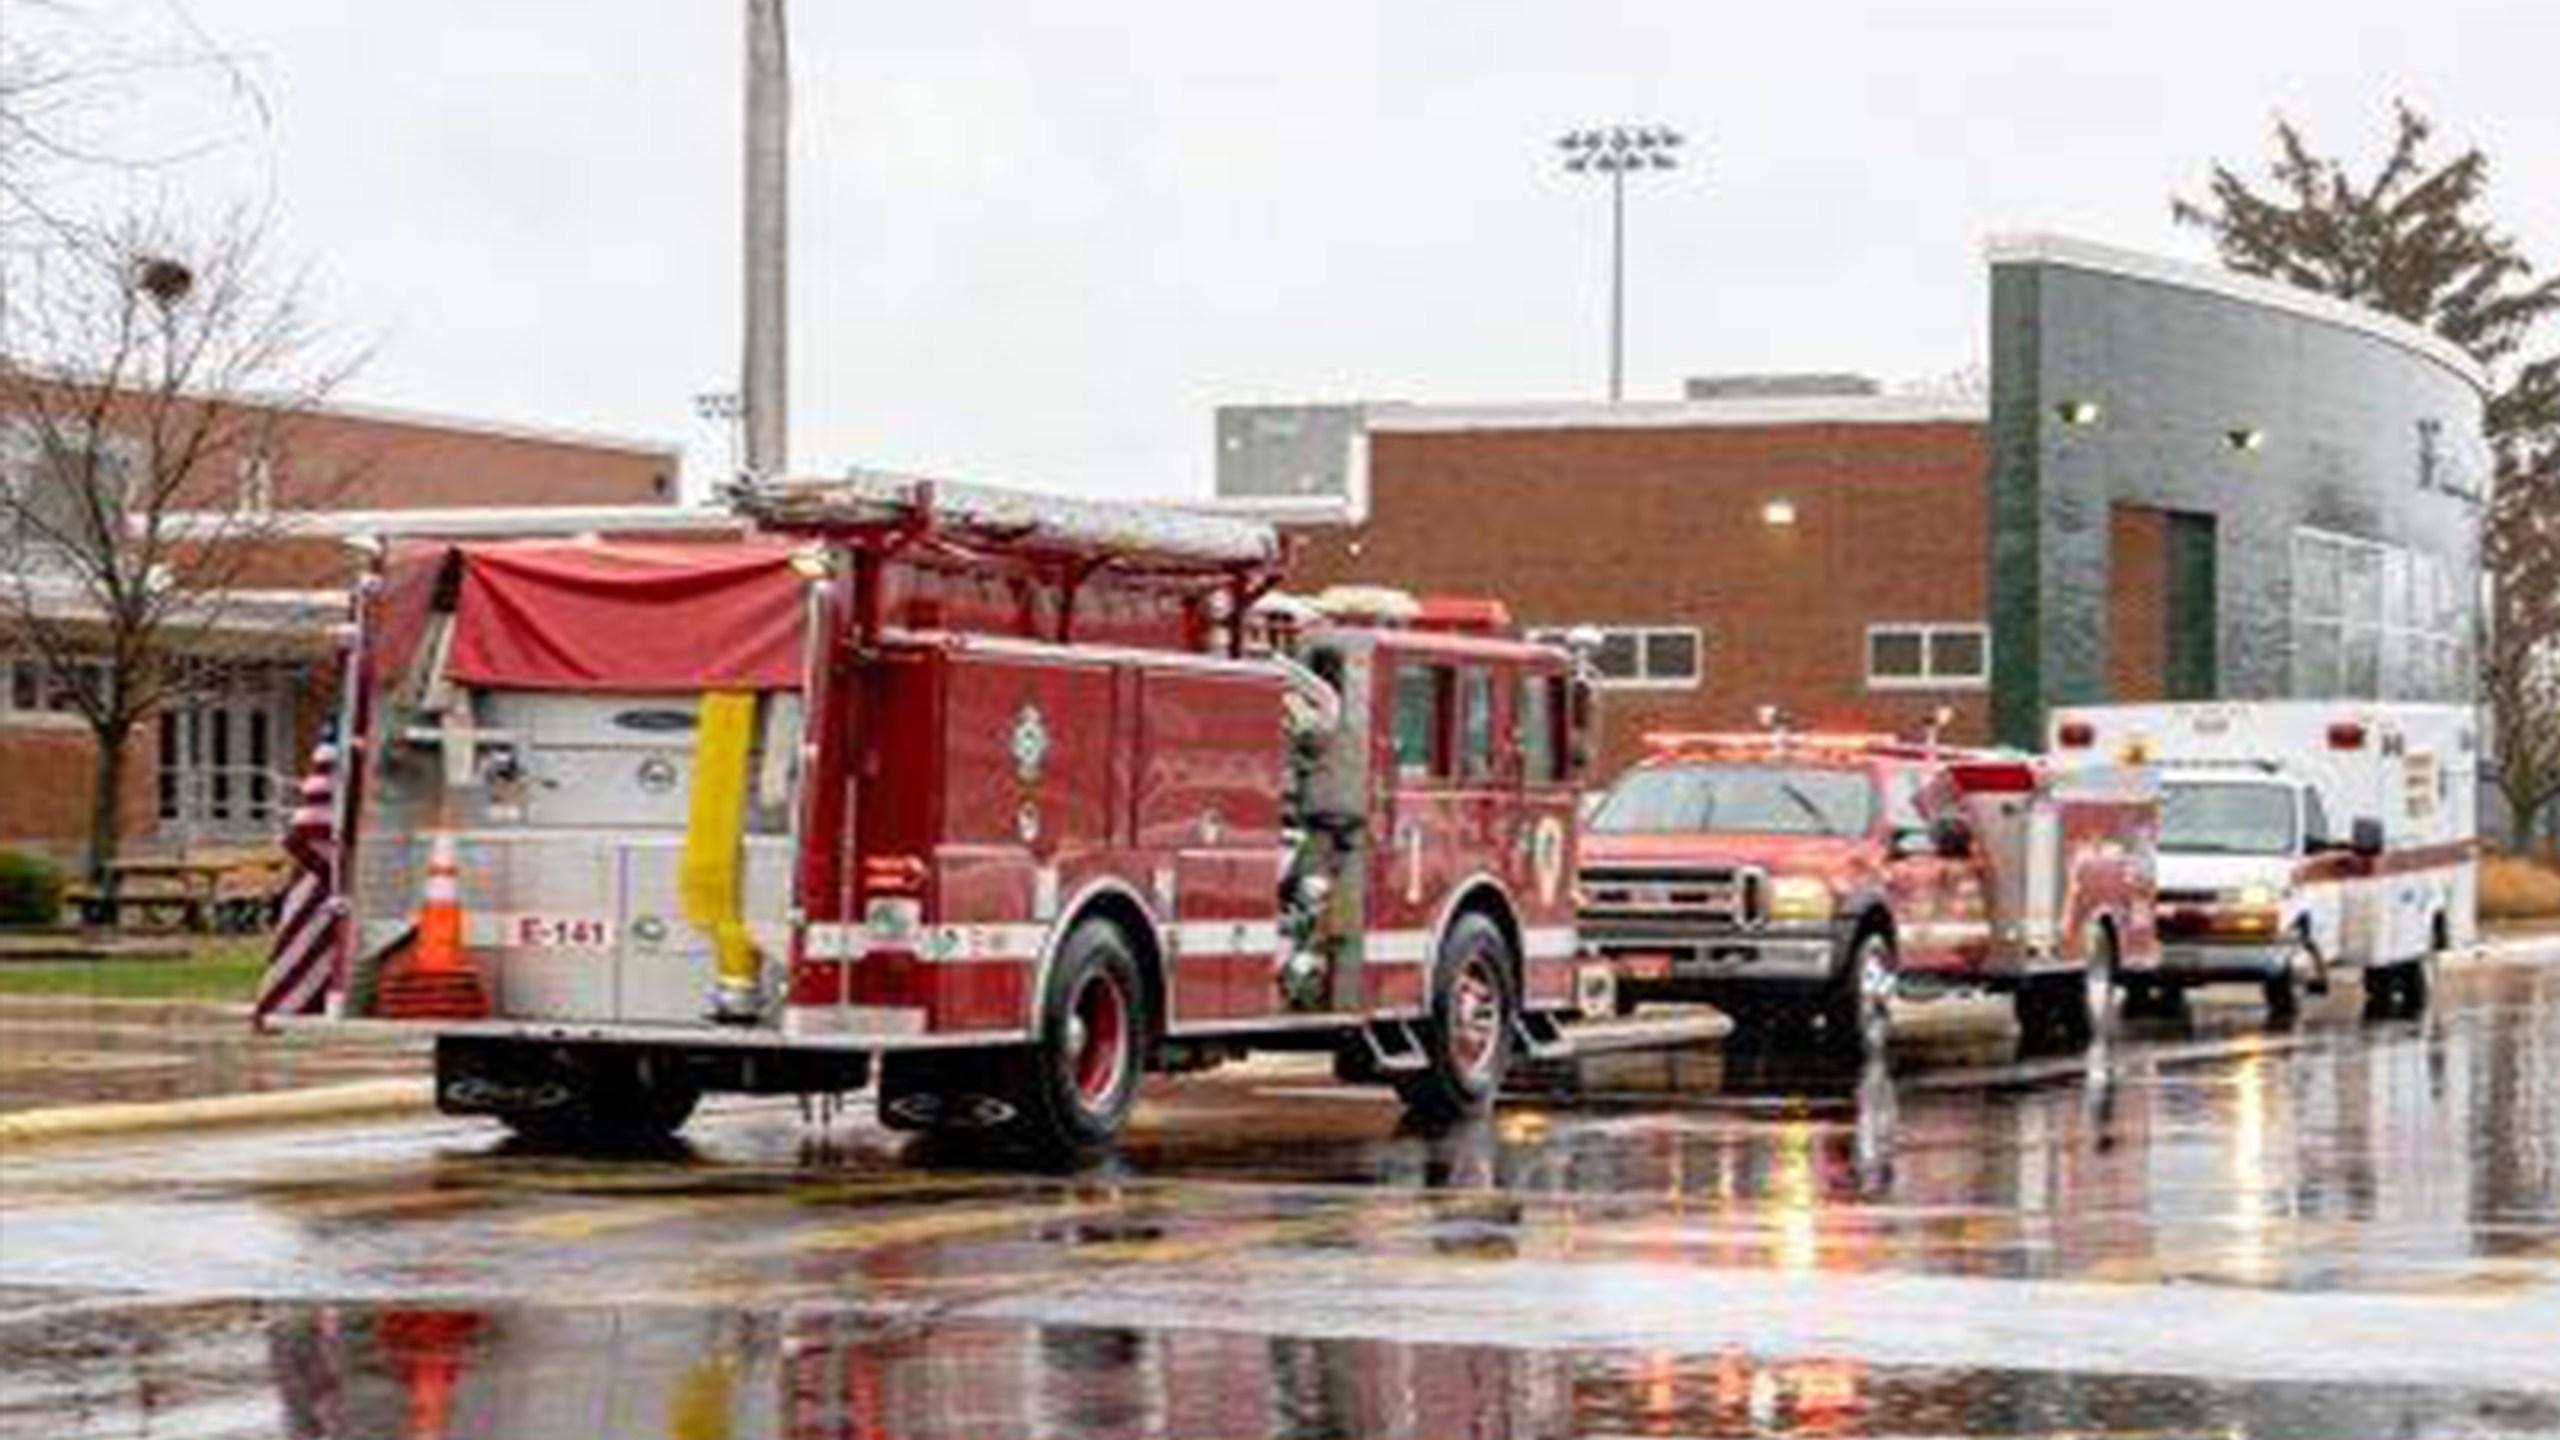 2 injured in Greenville HS fire